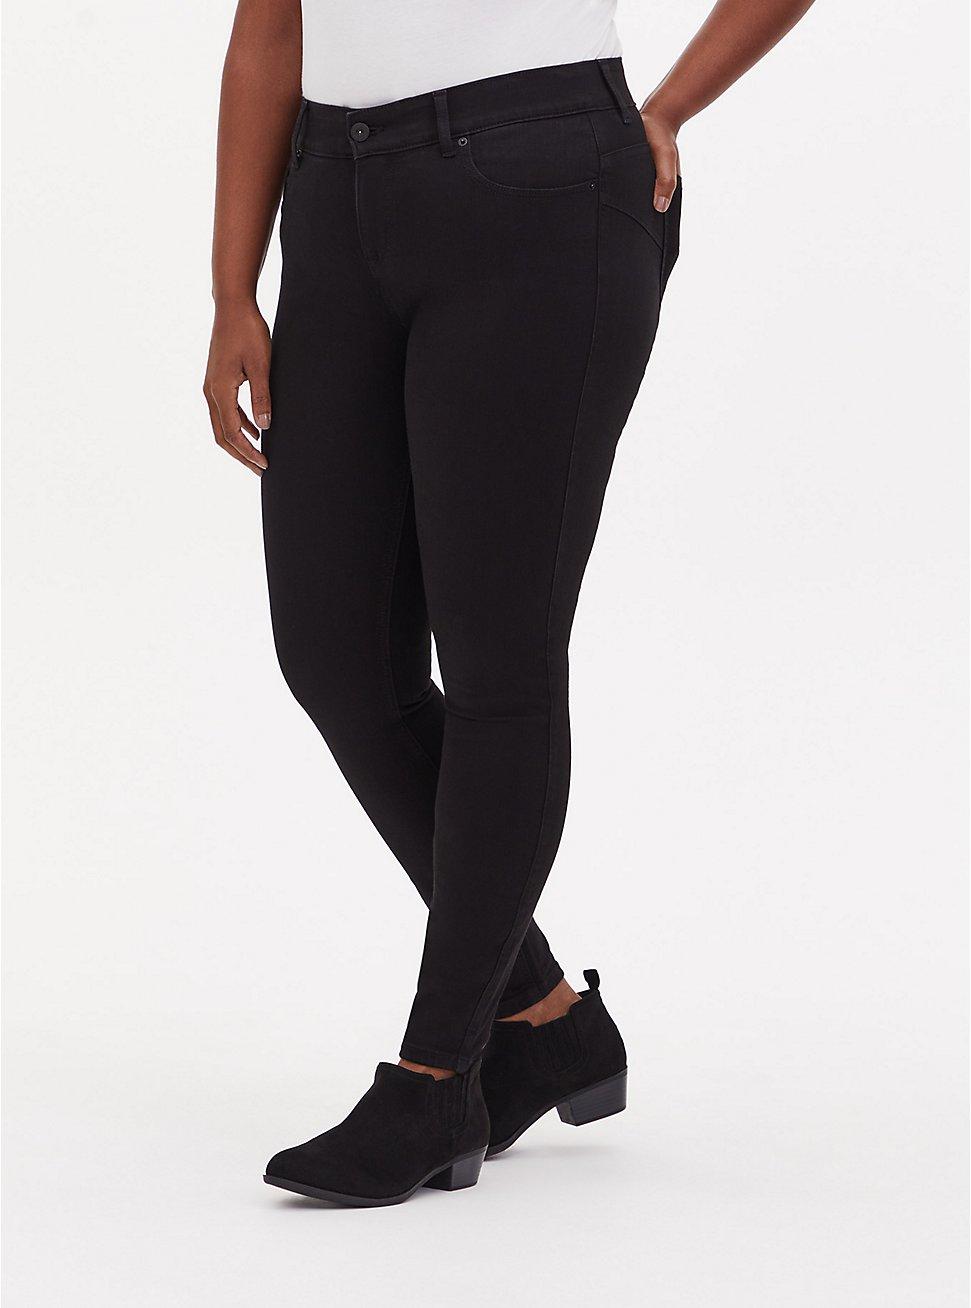 Bombshell Skinny Jean - Premium Stretch Black, , fitModel1-hires